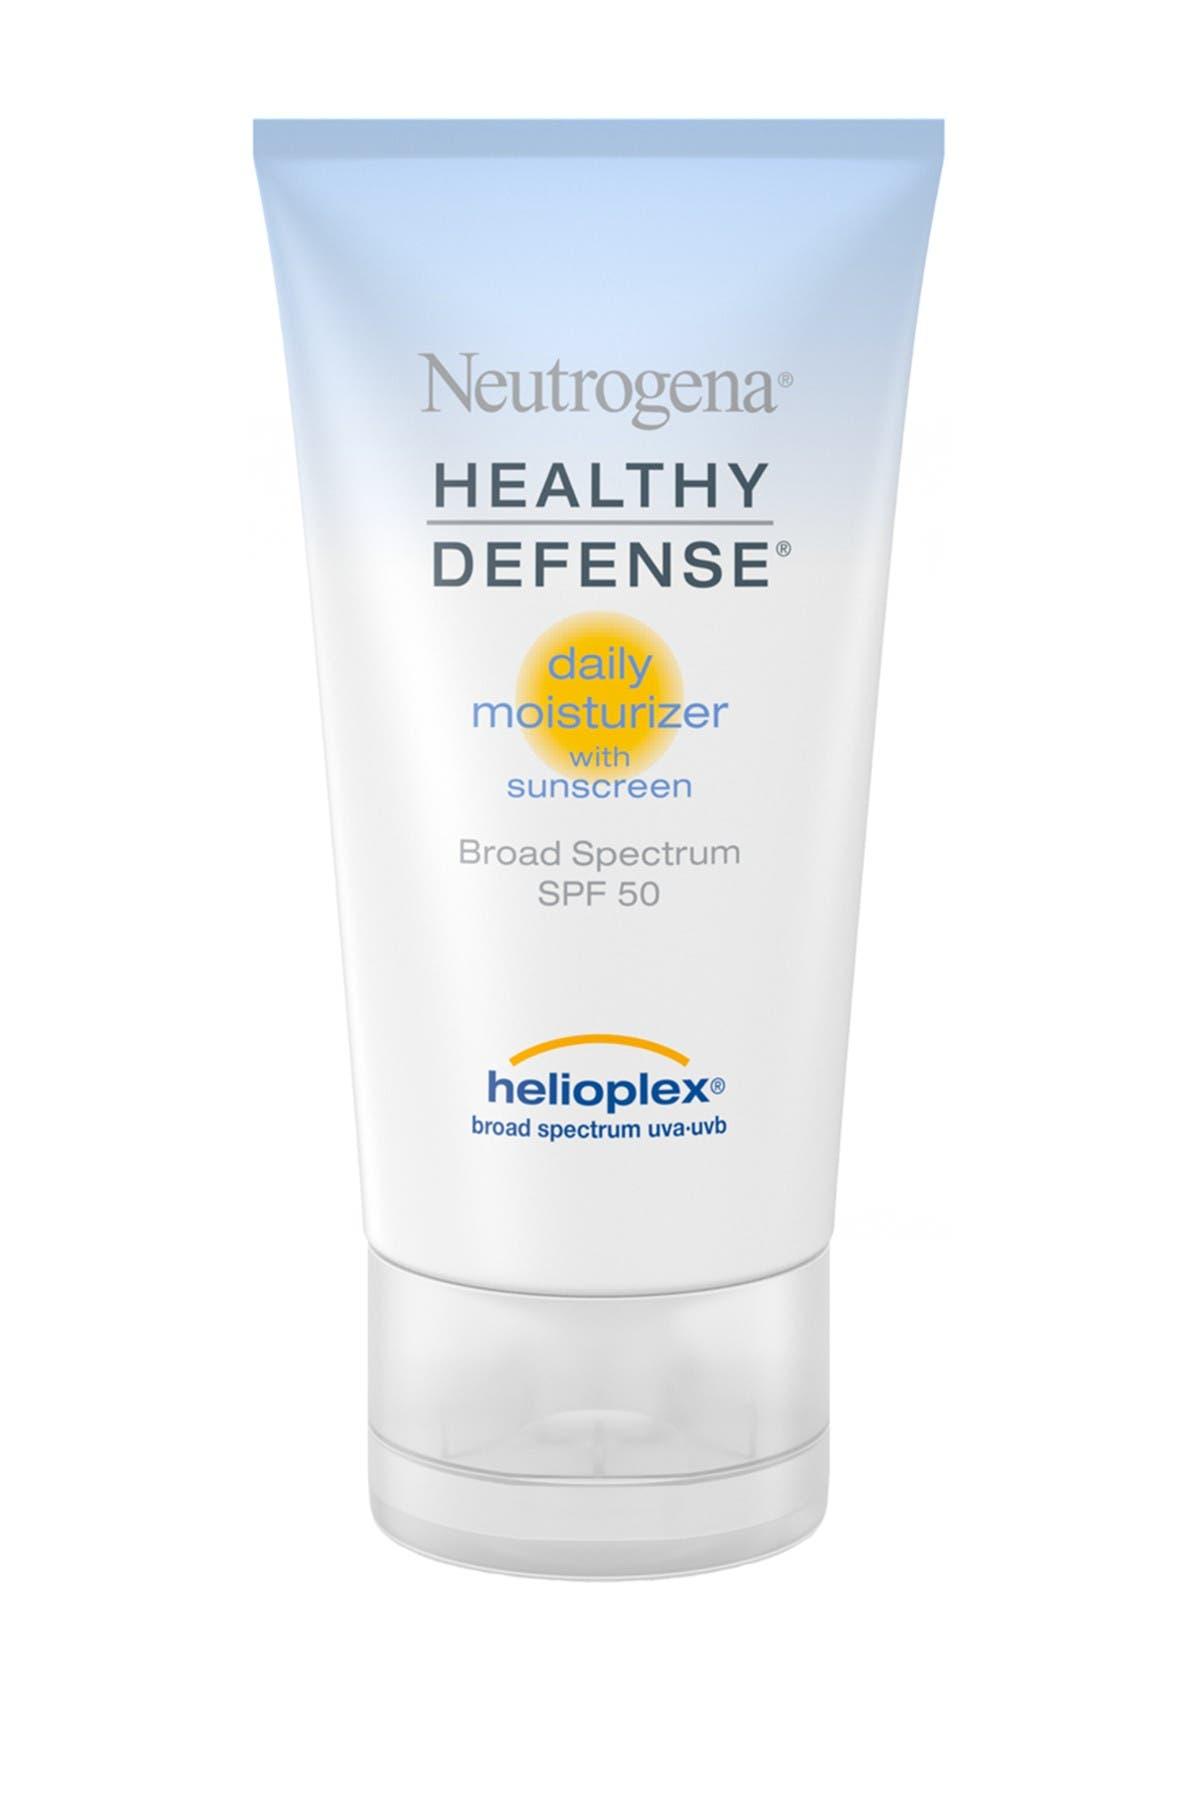 Image of Neutrogena Healthy Defense Daily Moisturizer Broad Spectrum SPF 50 Sunscreen - 1.7 Fl. Oz